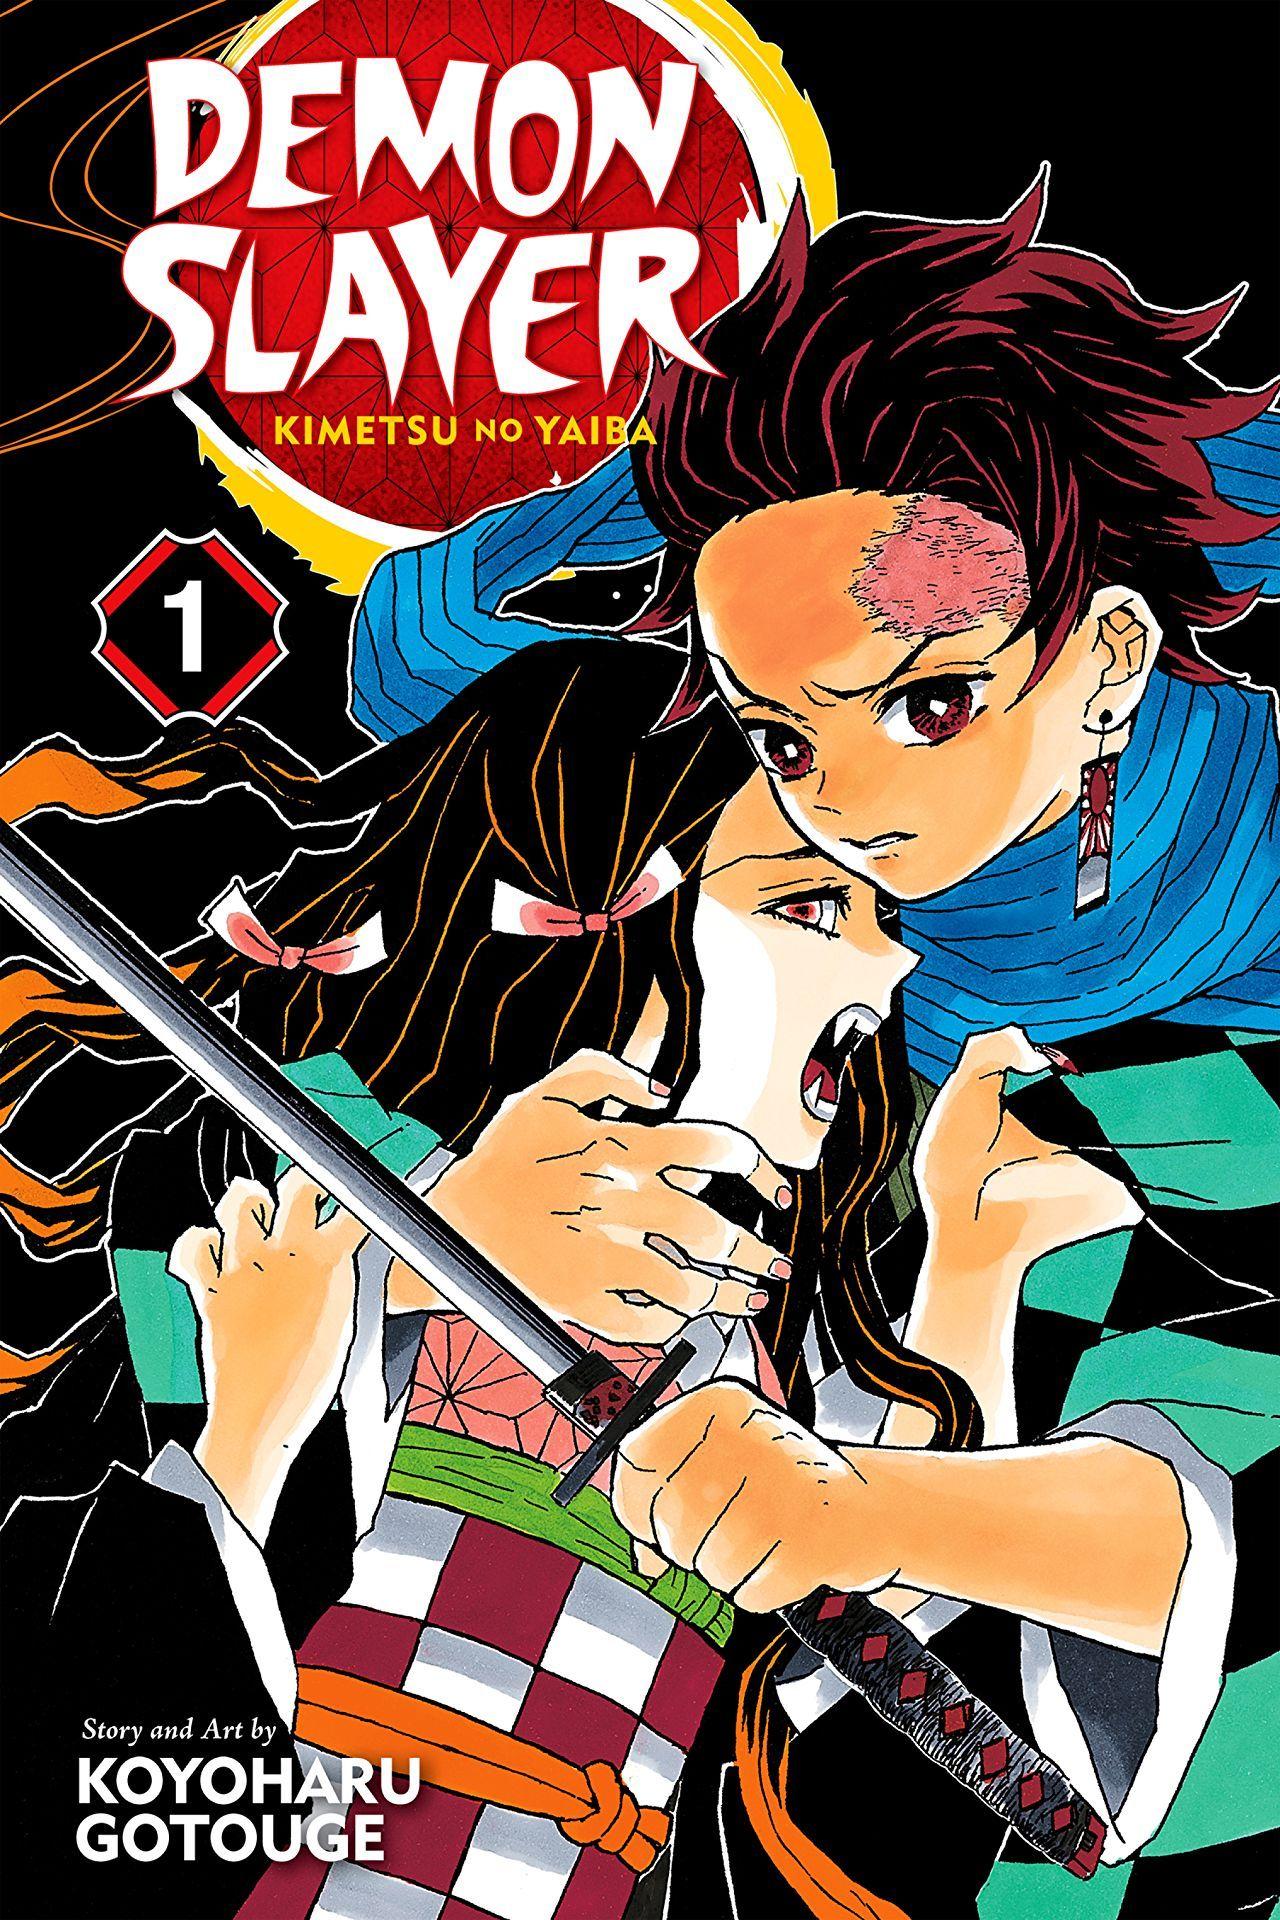 Demon Slayer Kimetsu no Yaiba Vol. 1 Anime demon, Anime